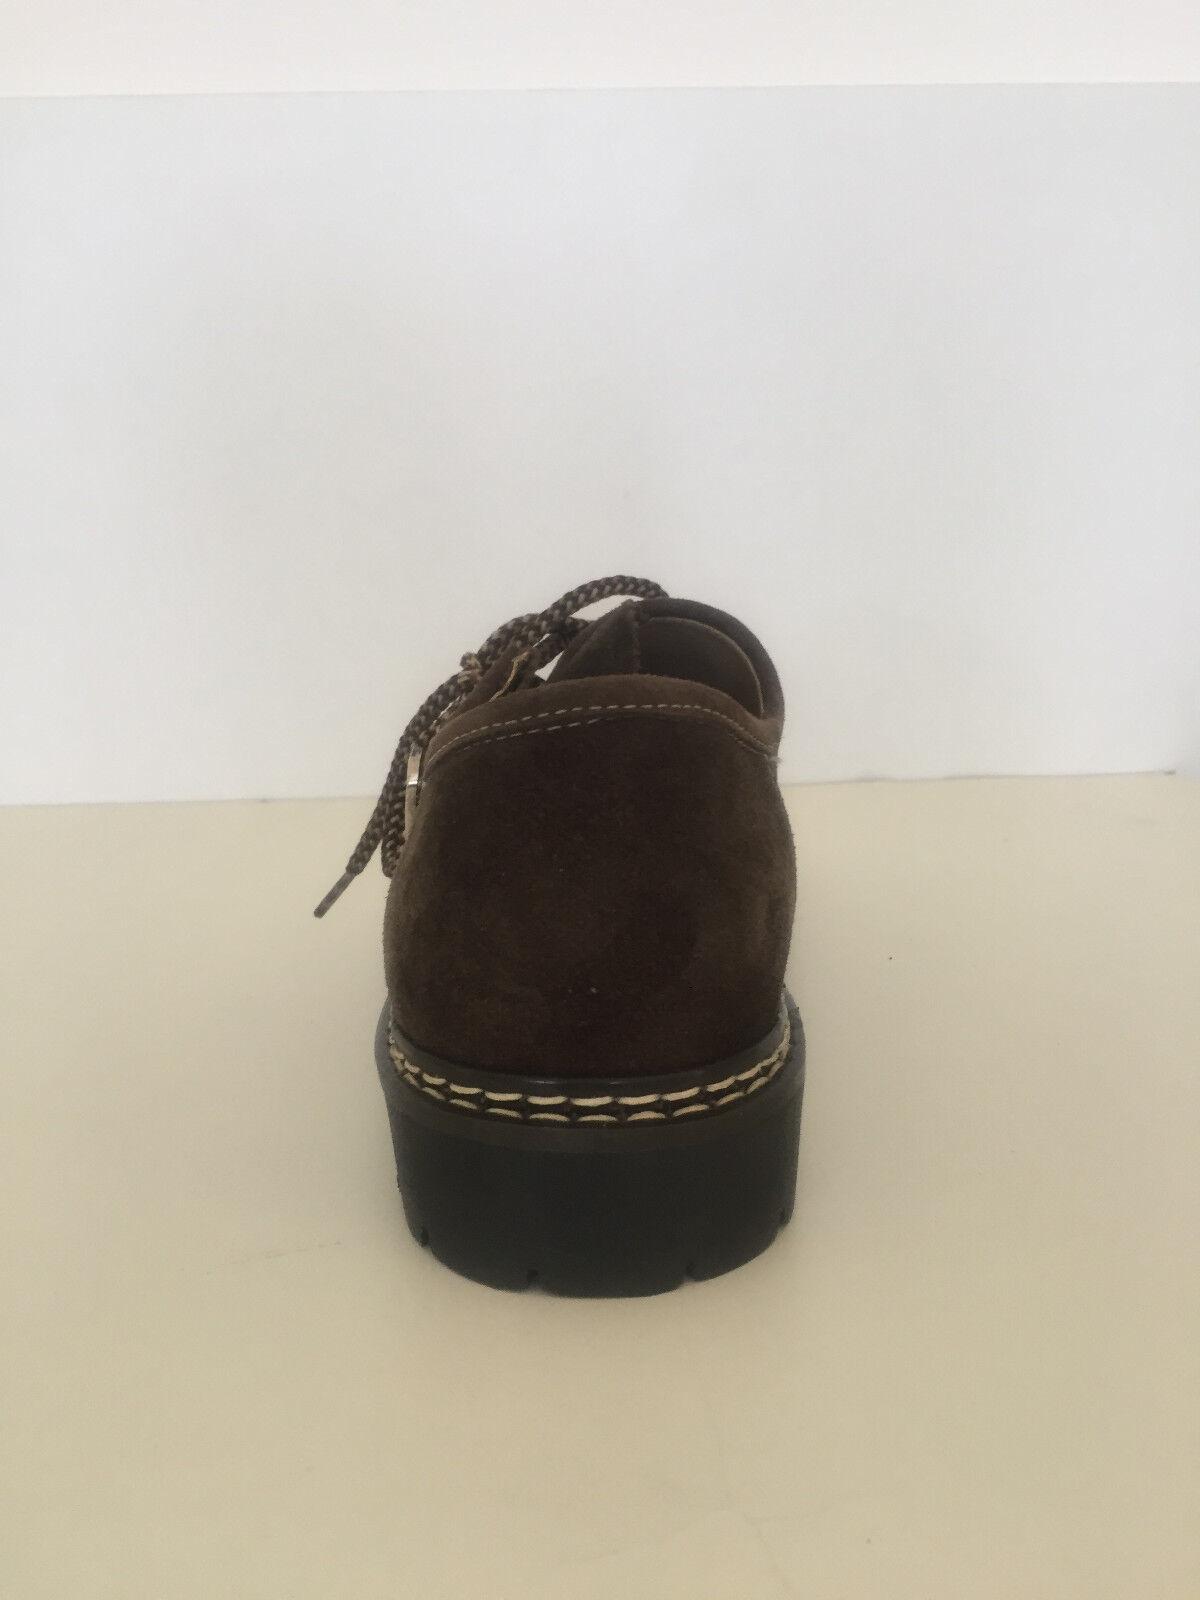 Chaussures Hommes Chaussures Hommes haferlschuhe des chaussures rangers chaussures des de course en cuir noir f4733d